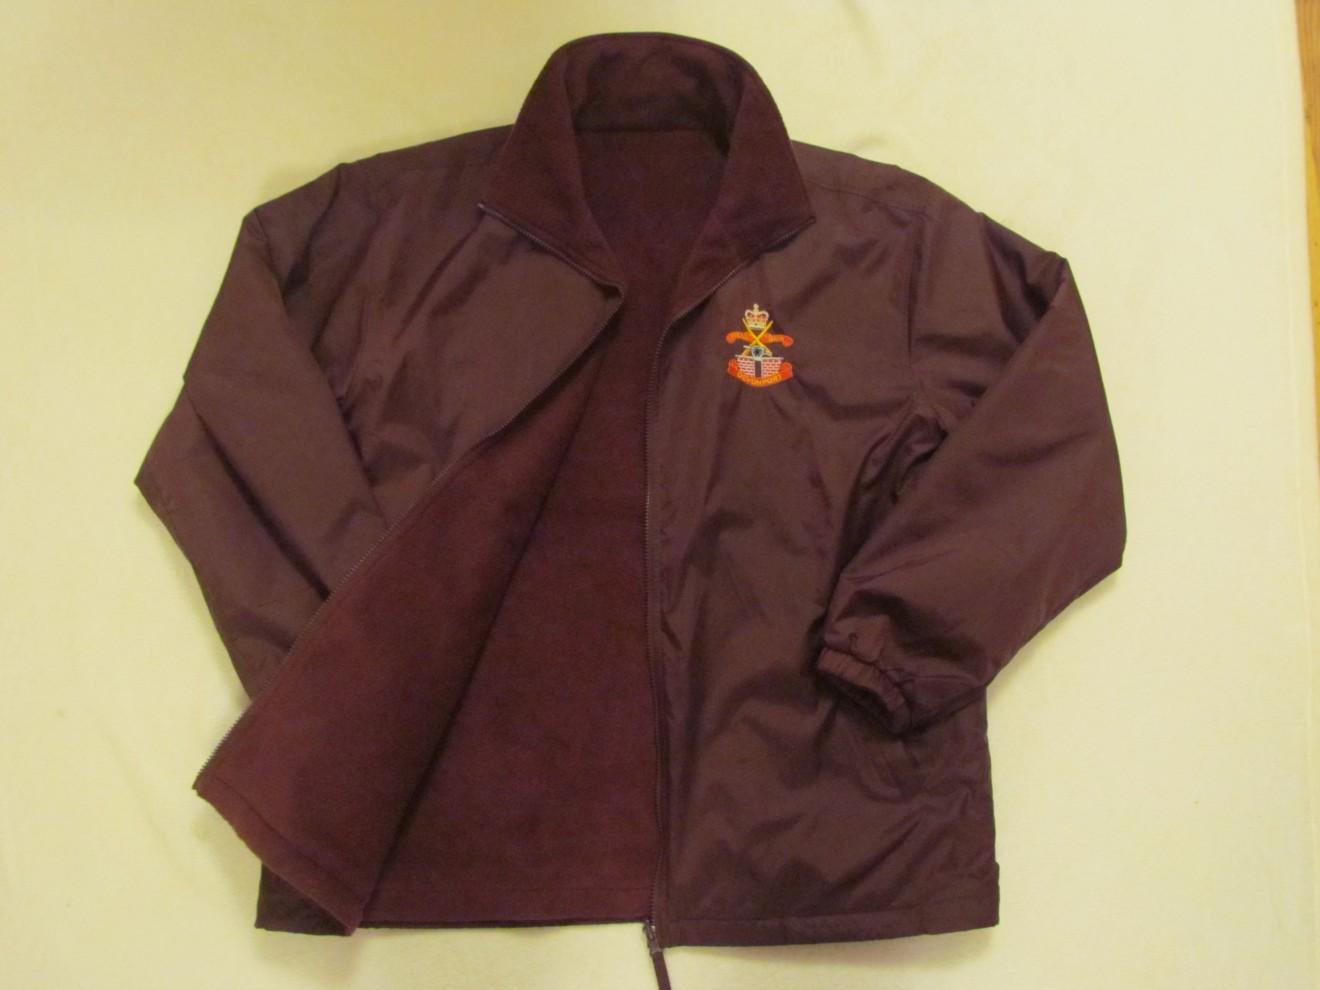 Association Fleece Lined Jacket 2014